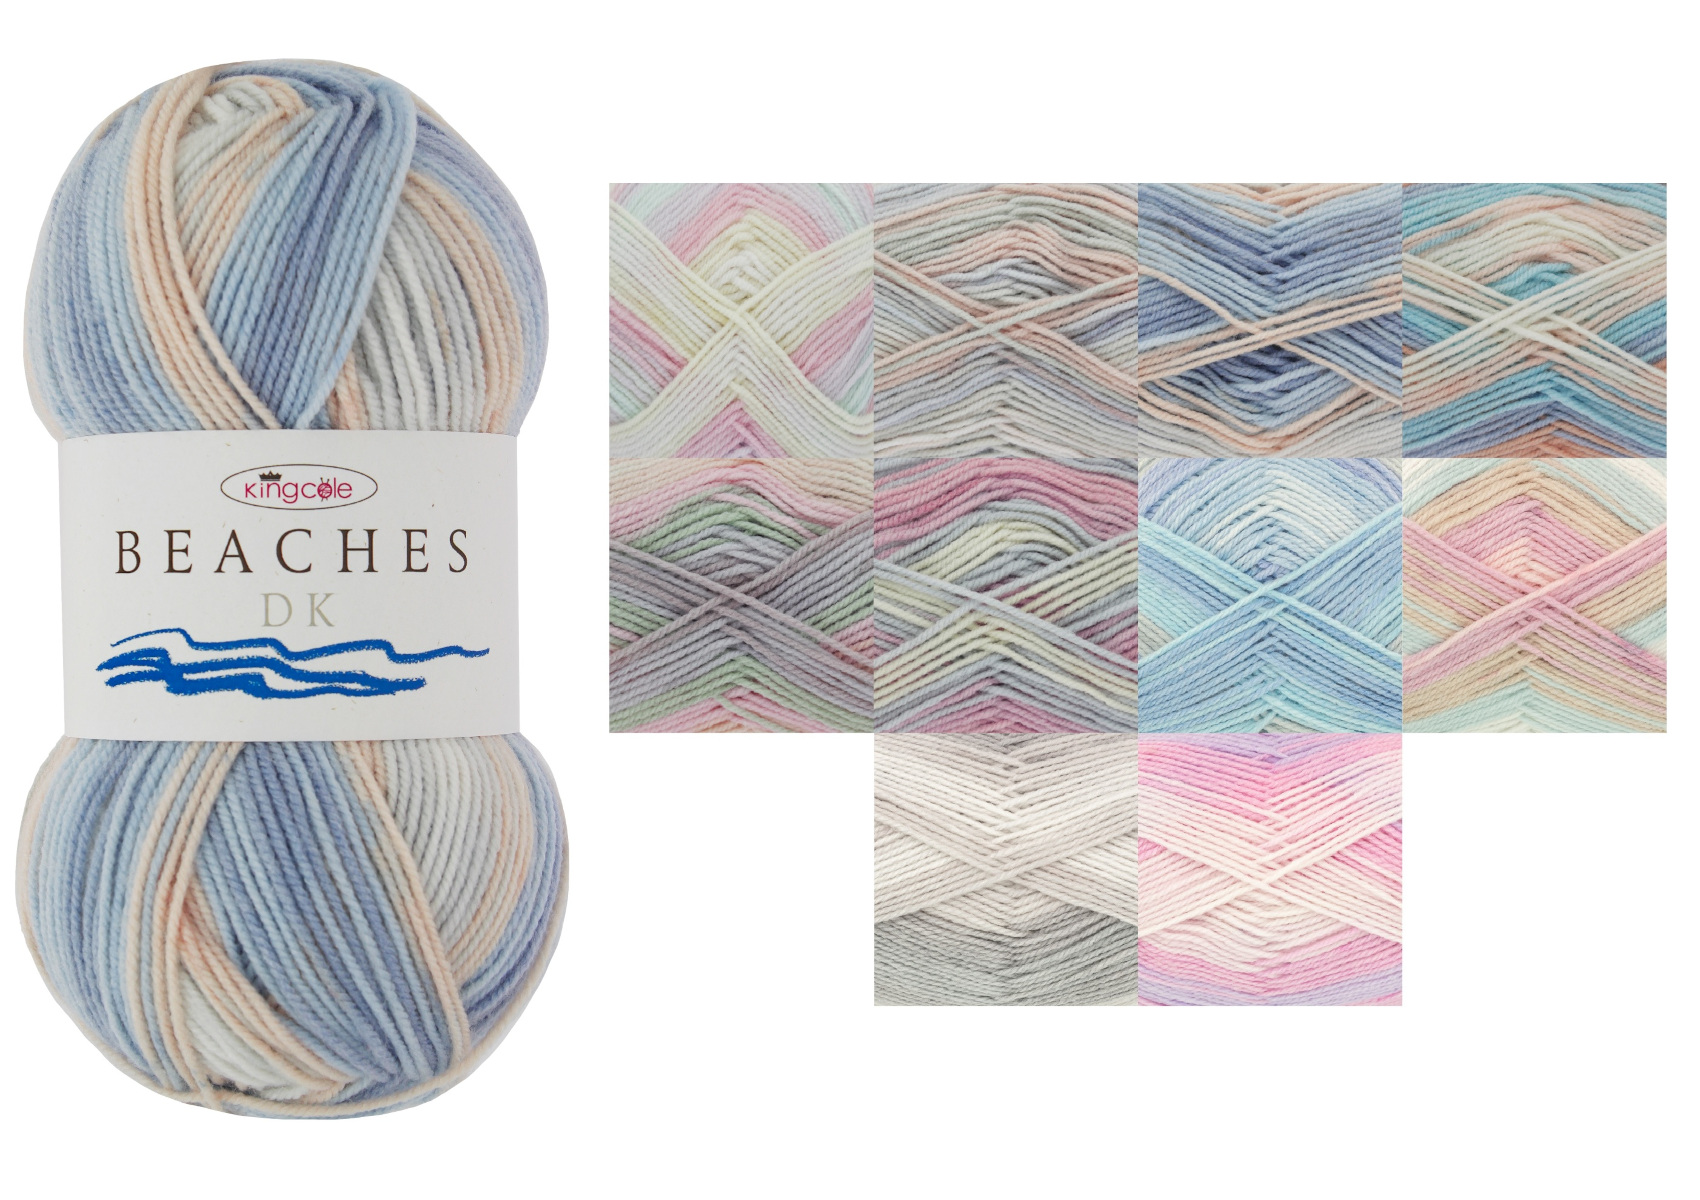 100g King Cole Beaches DK Knitting Yarn Shade Bondi Beach